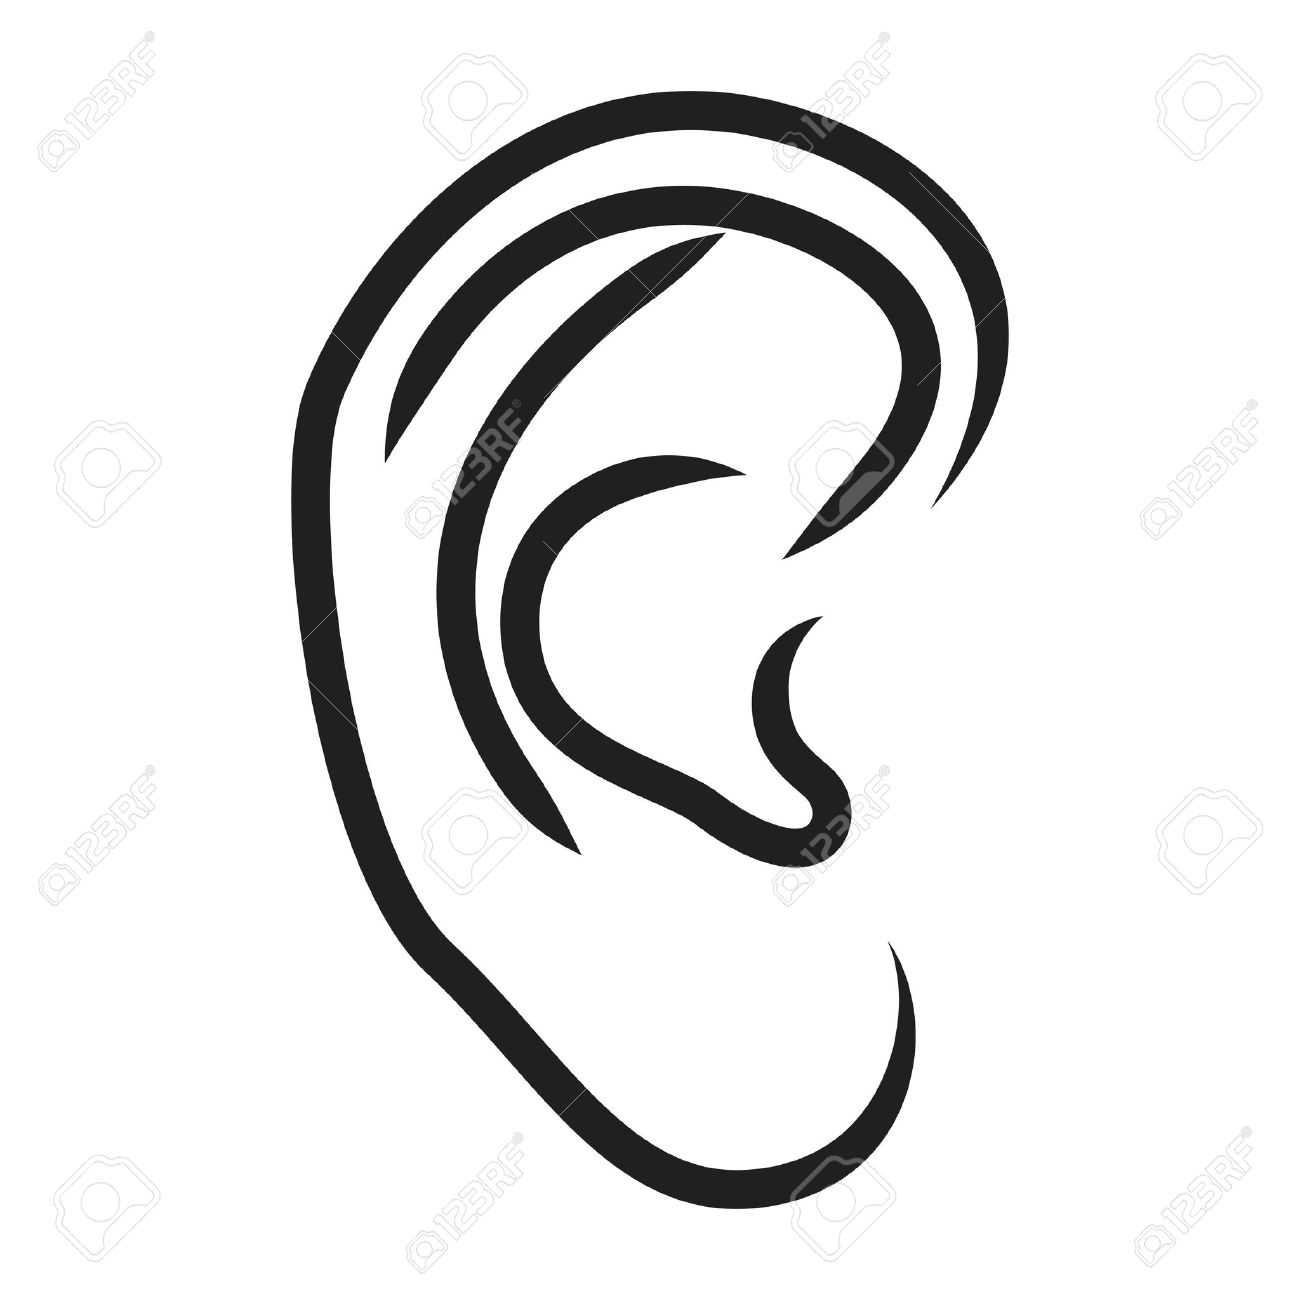 Drawing human ear royalty free stock photography image 25570937 - Drawing Human Ear Royalty Free Stock Photography Image 25570937 Drawing Human Ear Royalty Free Stock